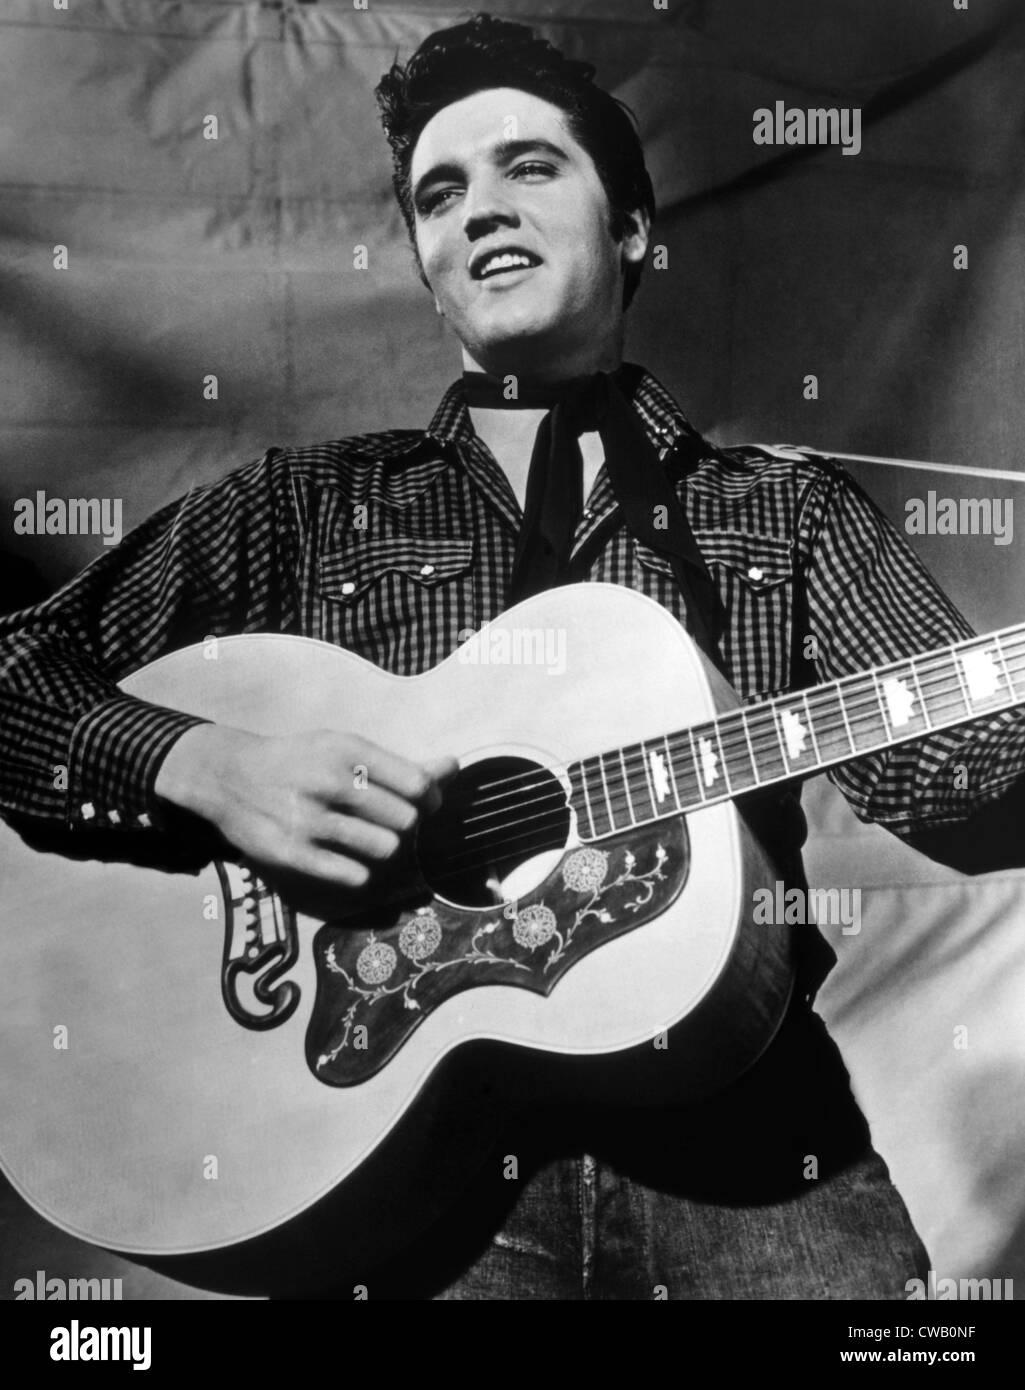 KING CREOLE, Elvis Presley, 1958 - Stock Image